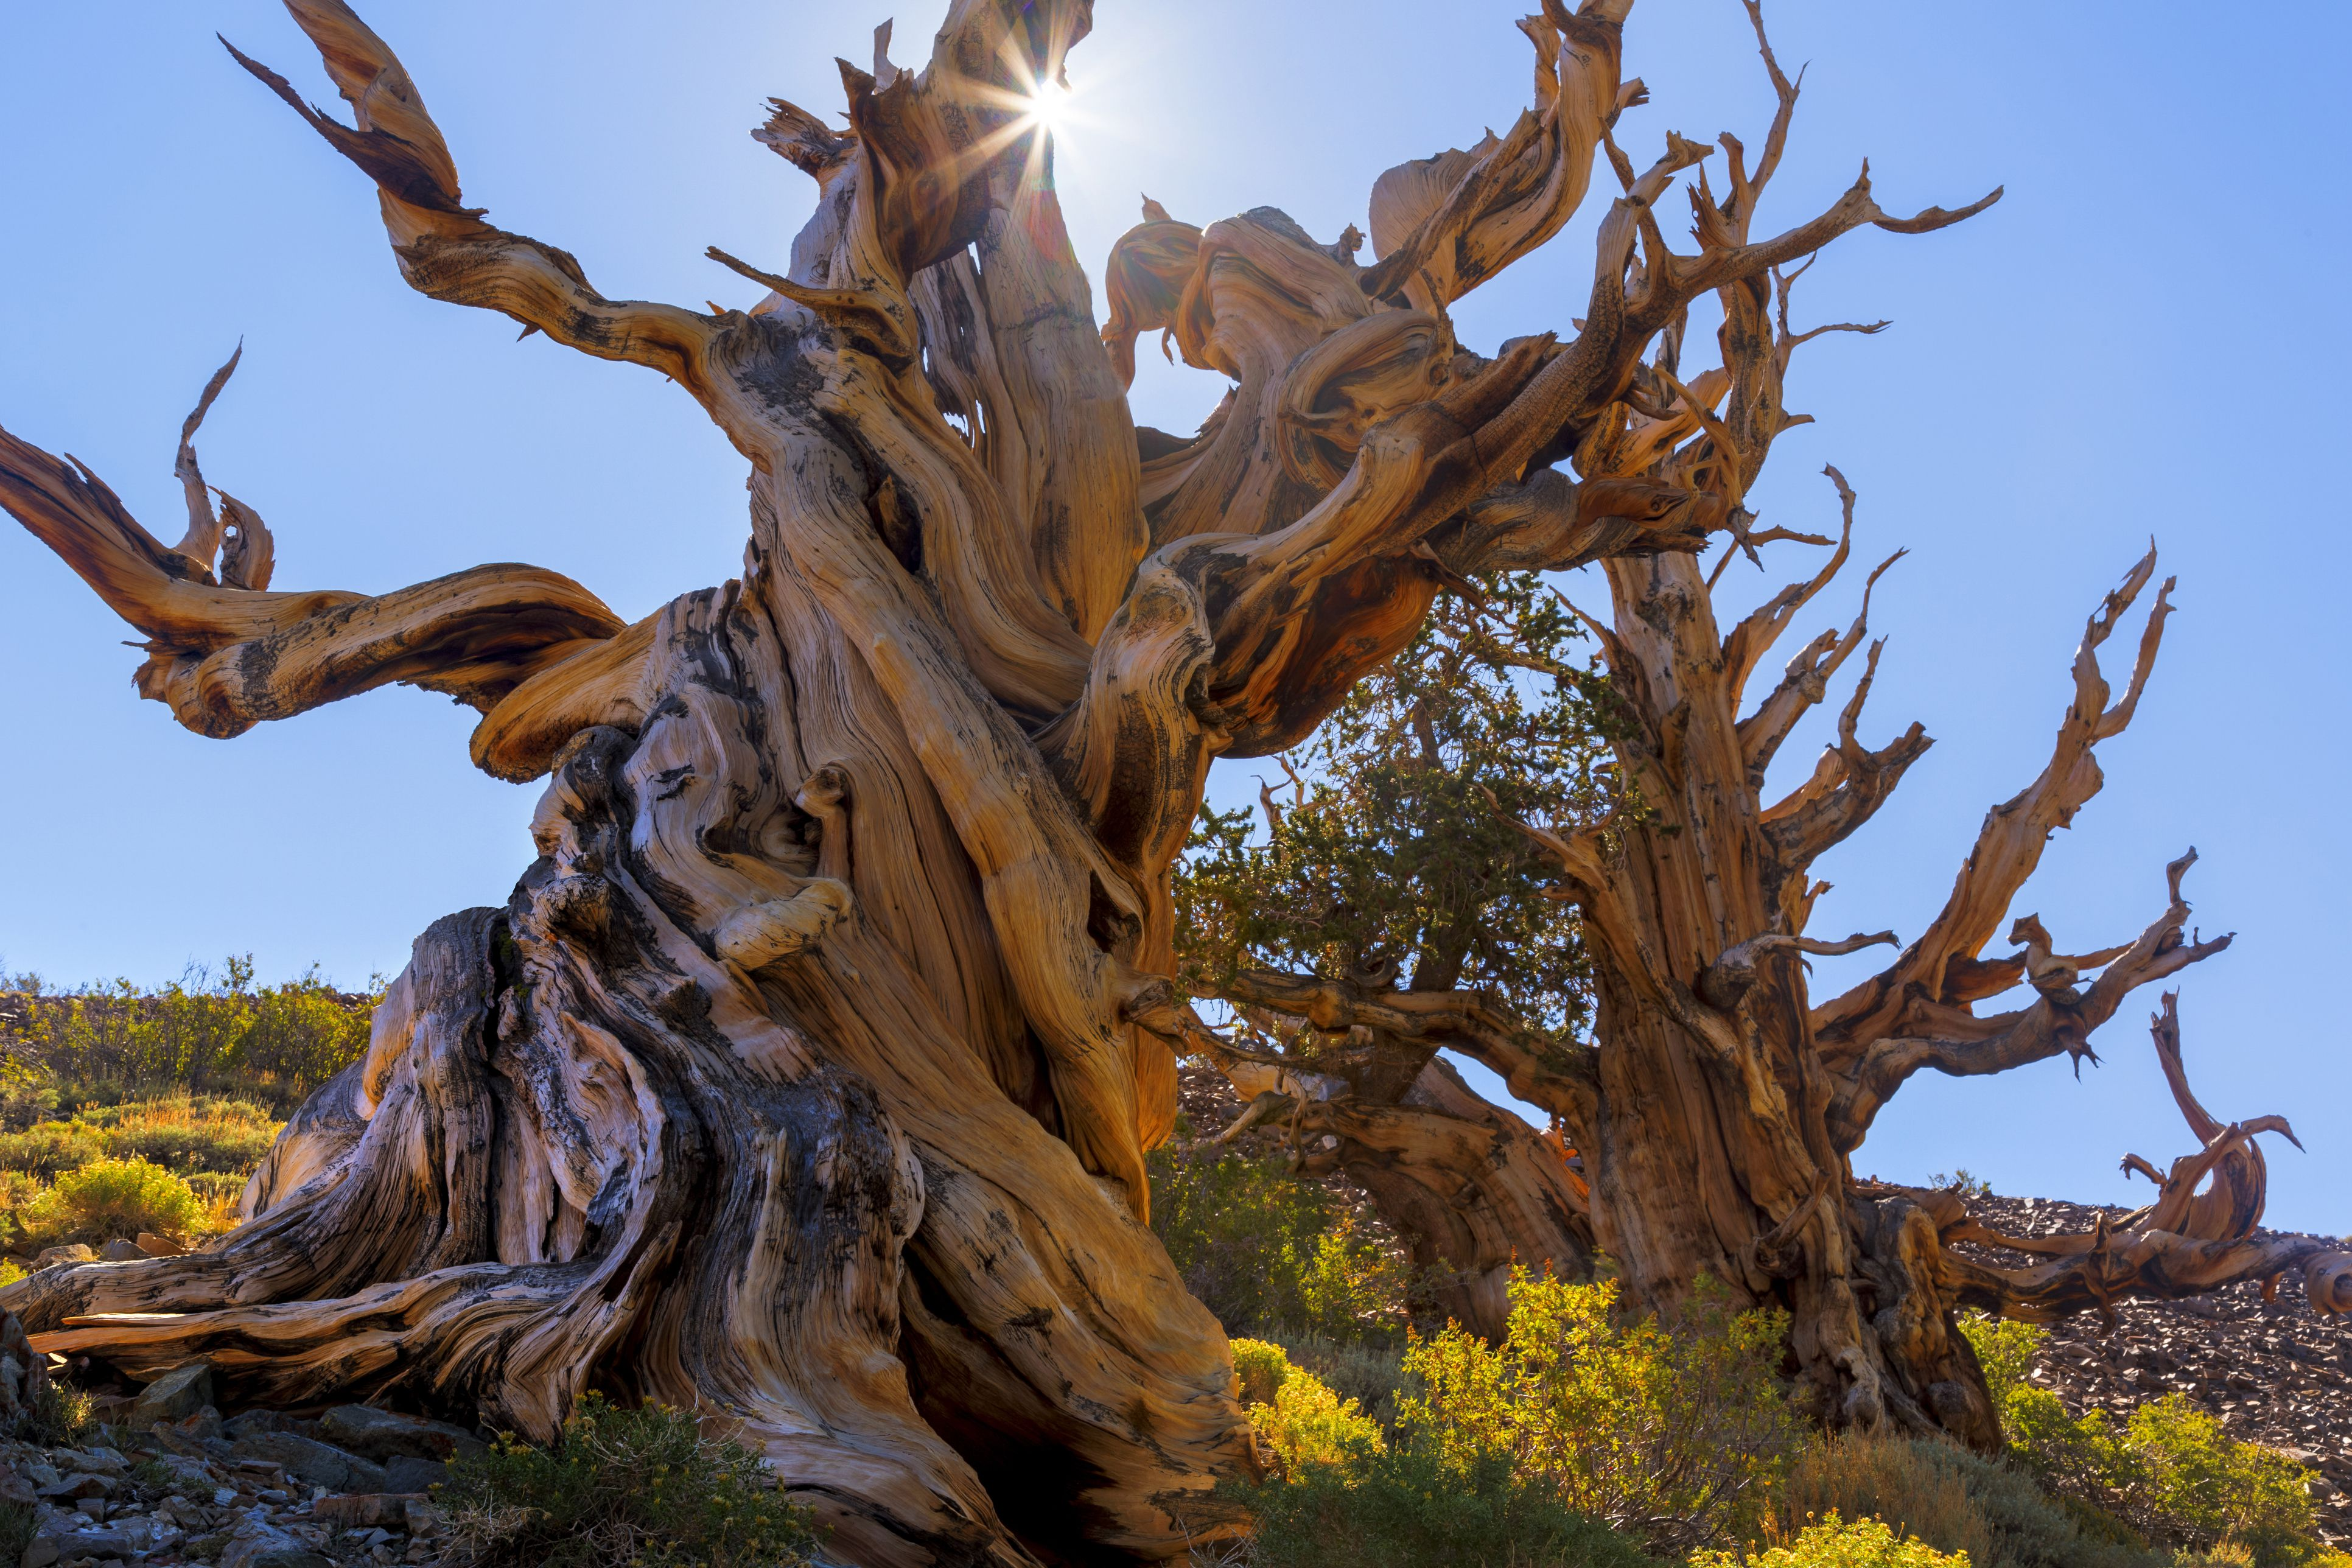 Sentinel Tree bristlecone pine, White Mountains Wilderness, California, USA